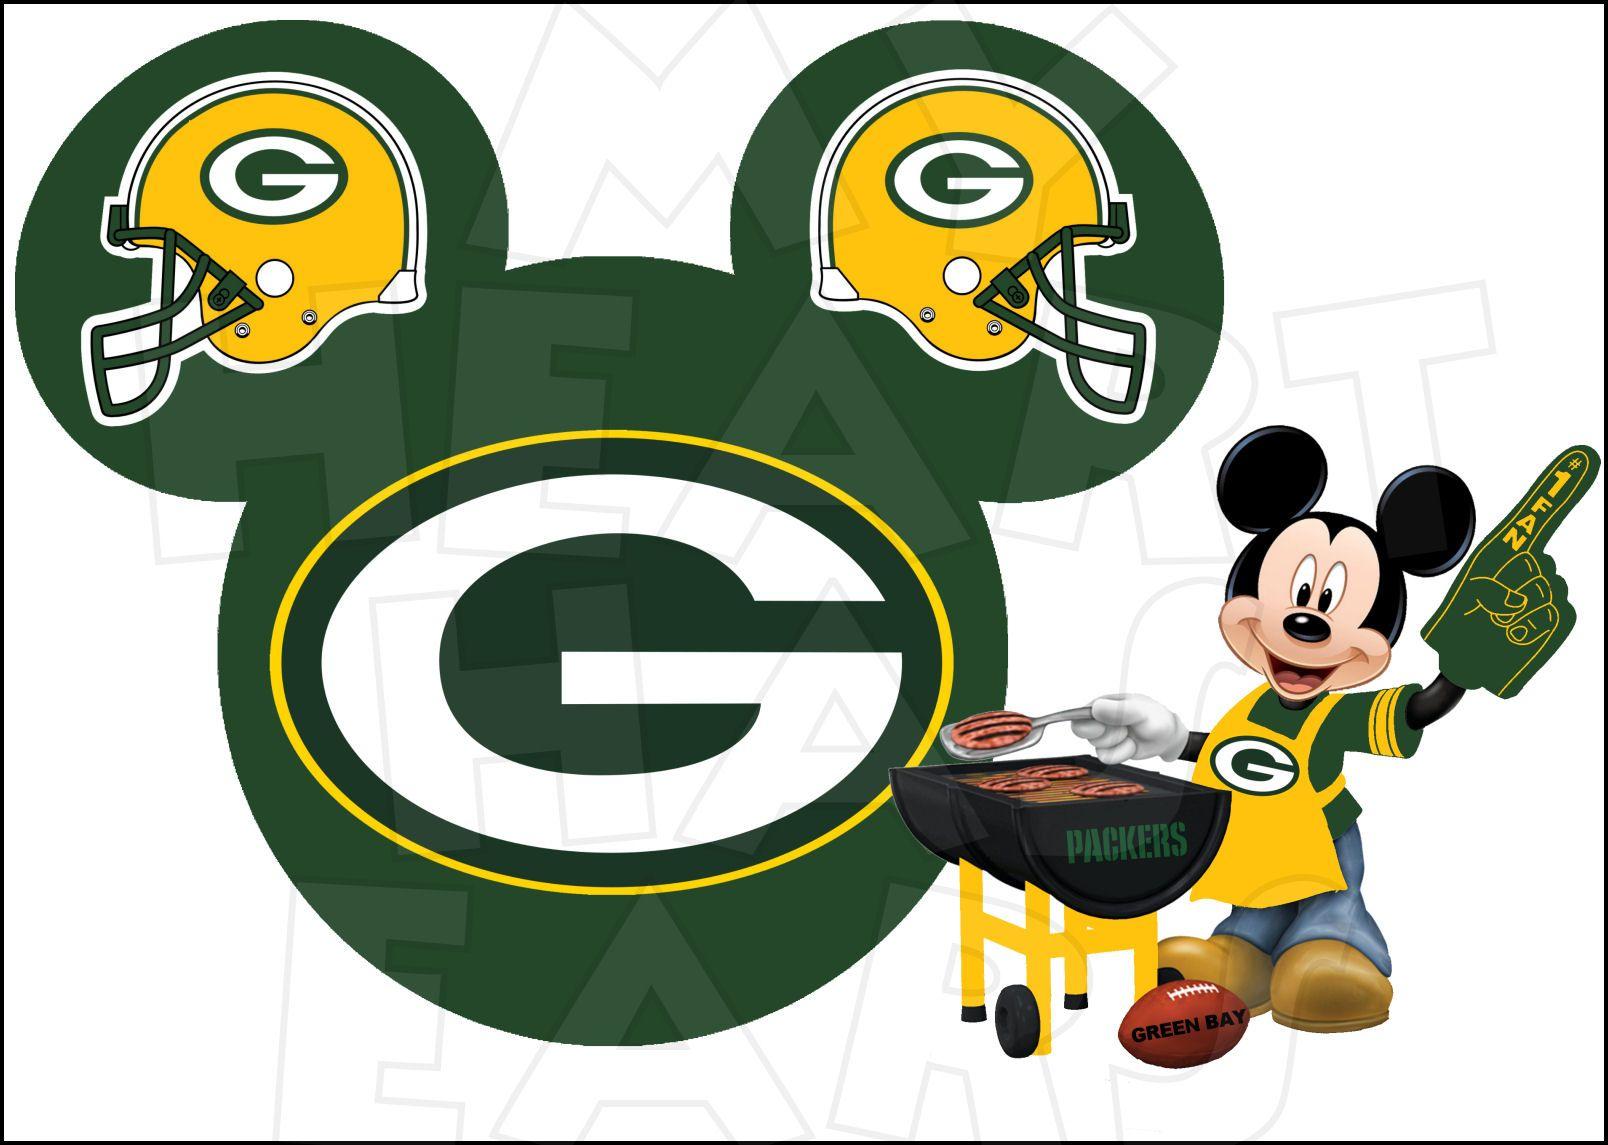 Green Bay Packers Football Clip Art Car Tuning Green Bay Packers Football Green Bay Packers Clothing Green Bay Packers